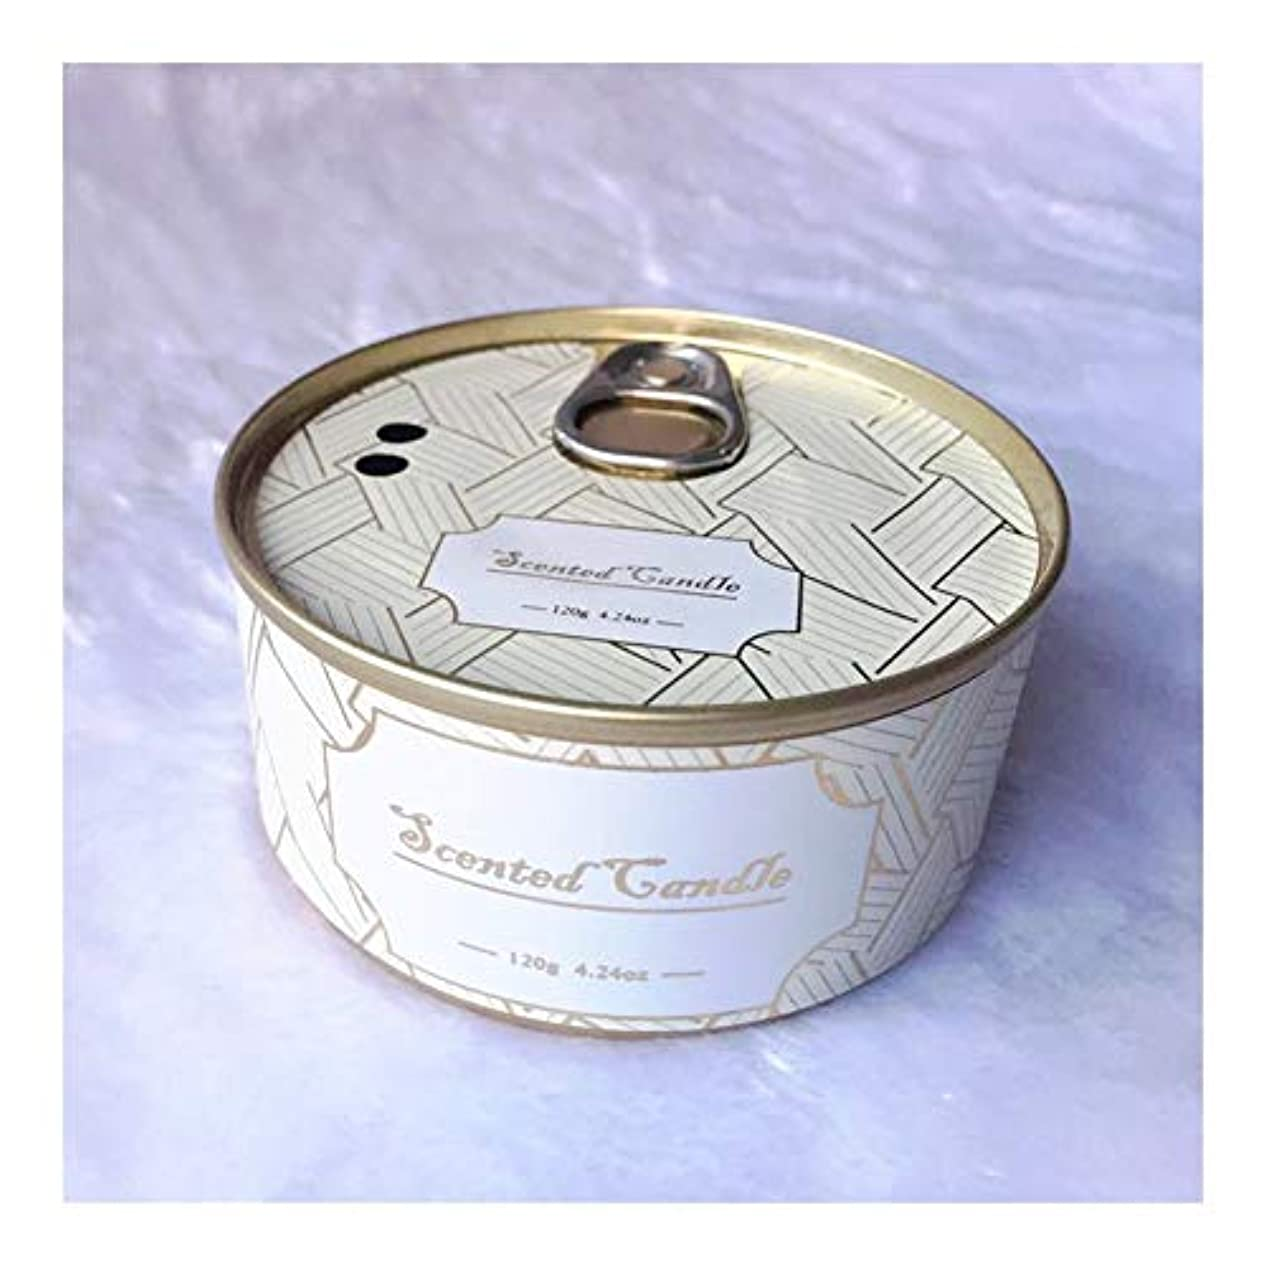 Guomao ブリキ缶植物エッセンシャルオイル大豆ワックスジュニパーラベンダーの香りのキャンドル (色 : Lavender)